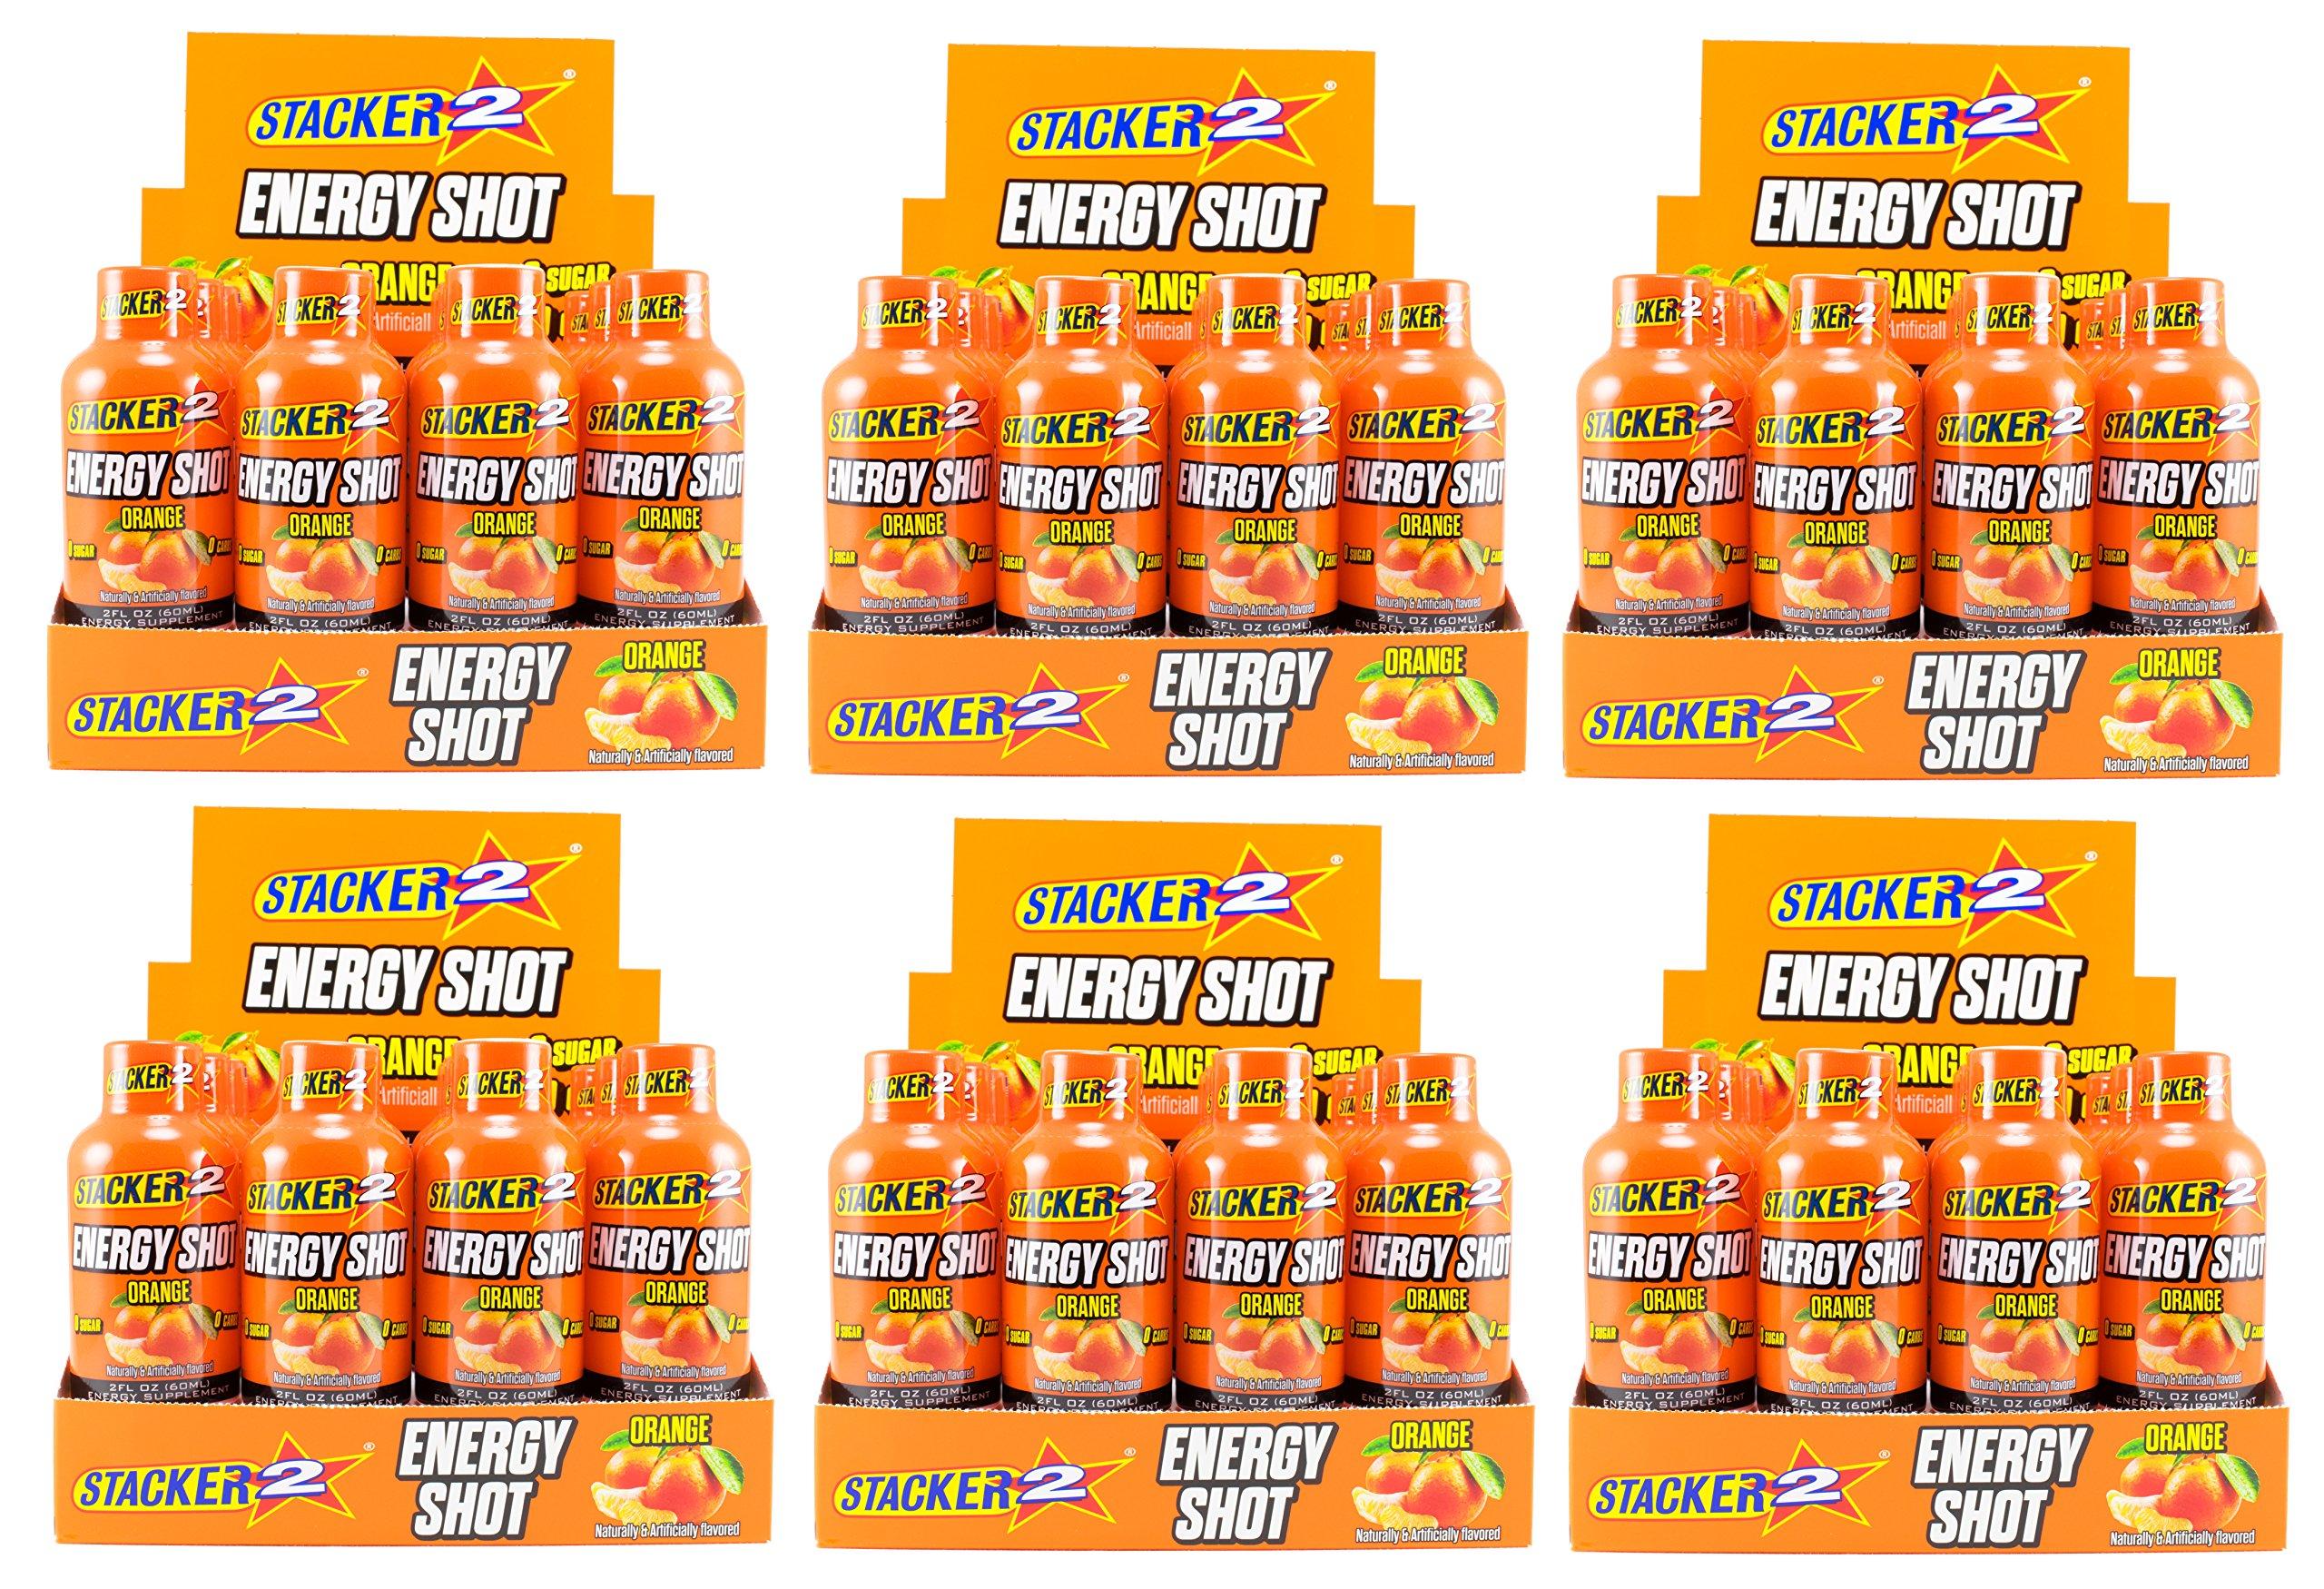 Stacker 2 Energy Shots, Orange Flavor 12pk (6)